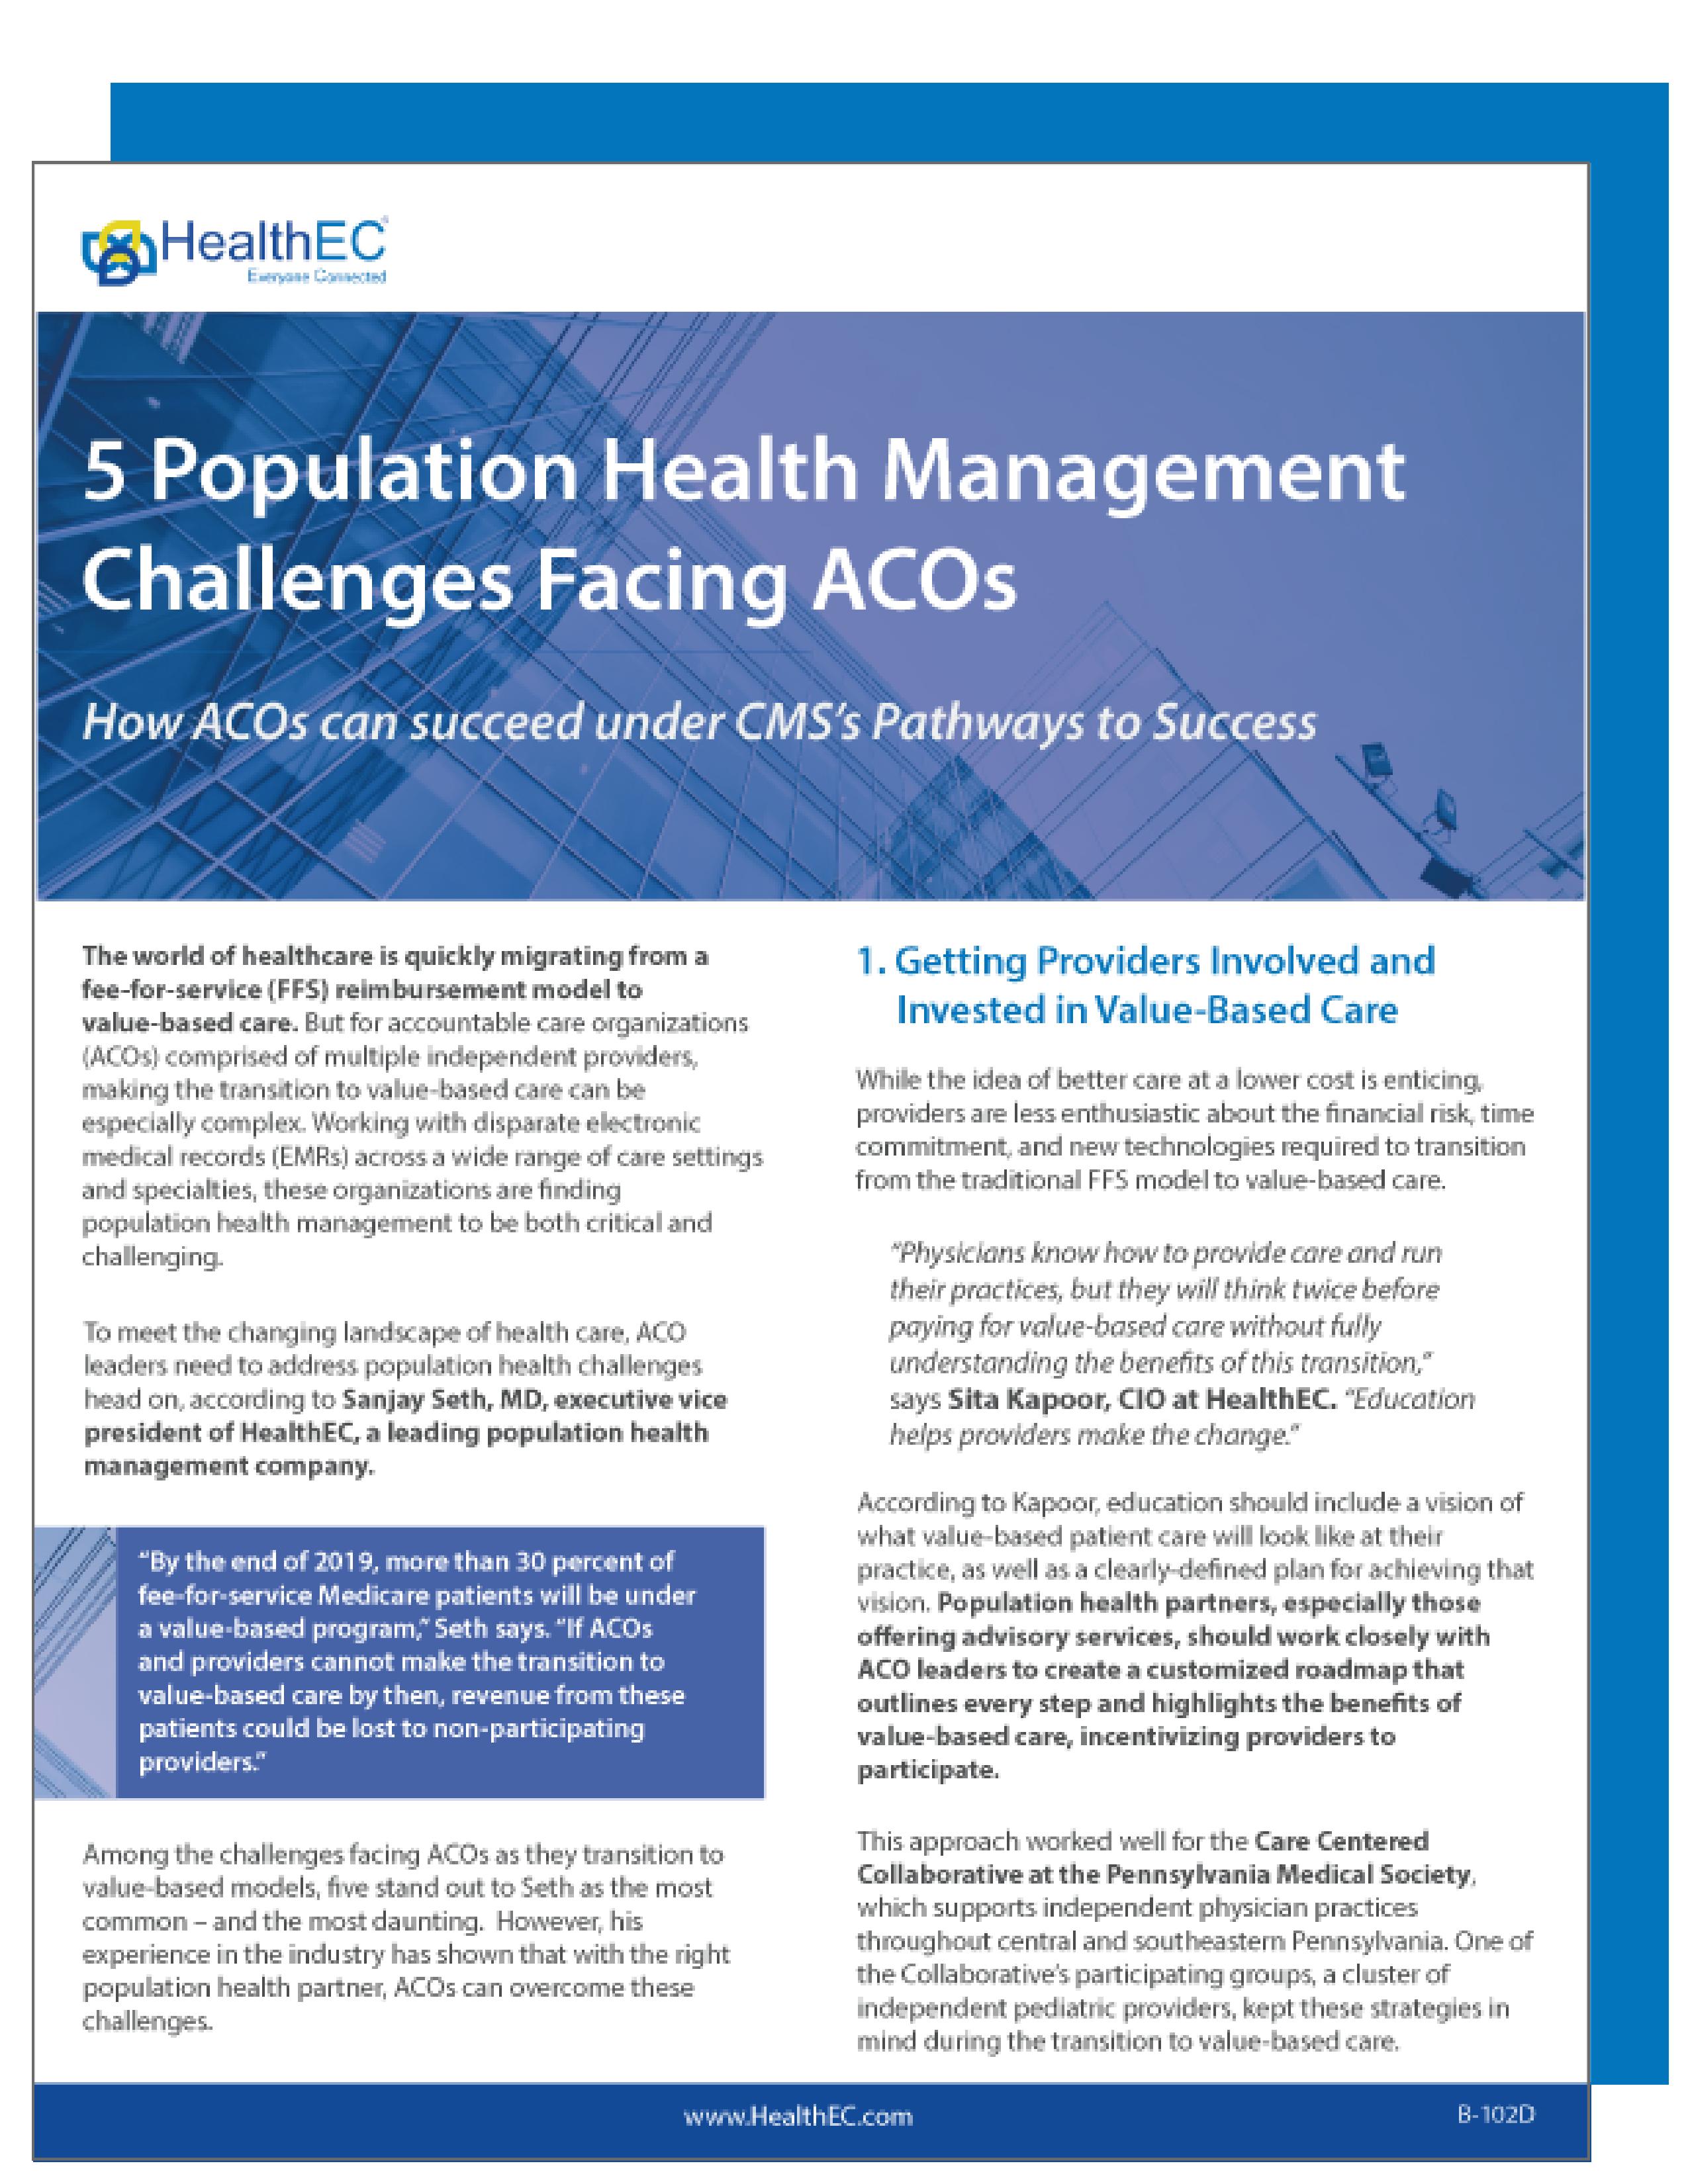 ACO-Challenges-LP-Image-1